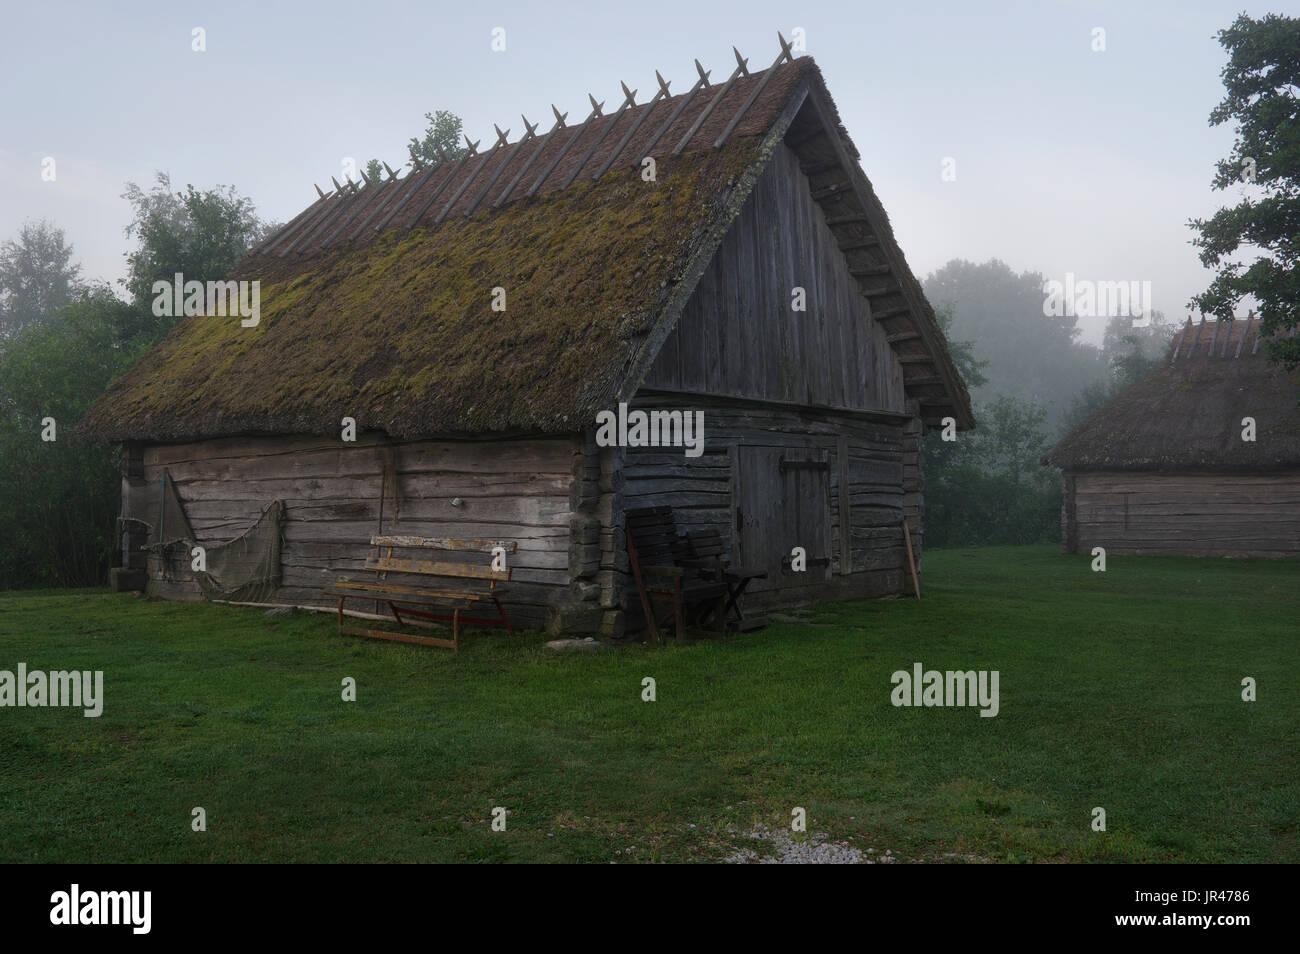 Fisherman's hut early foggy morning at Suitsu river, Matsalu National Park, Estonia, Europe - Stock Image